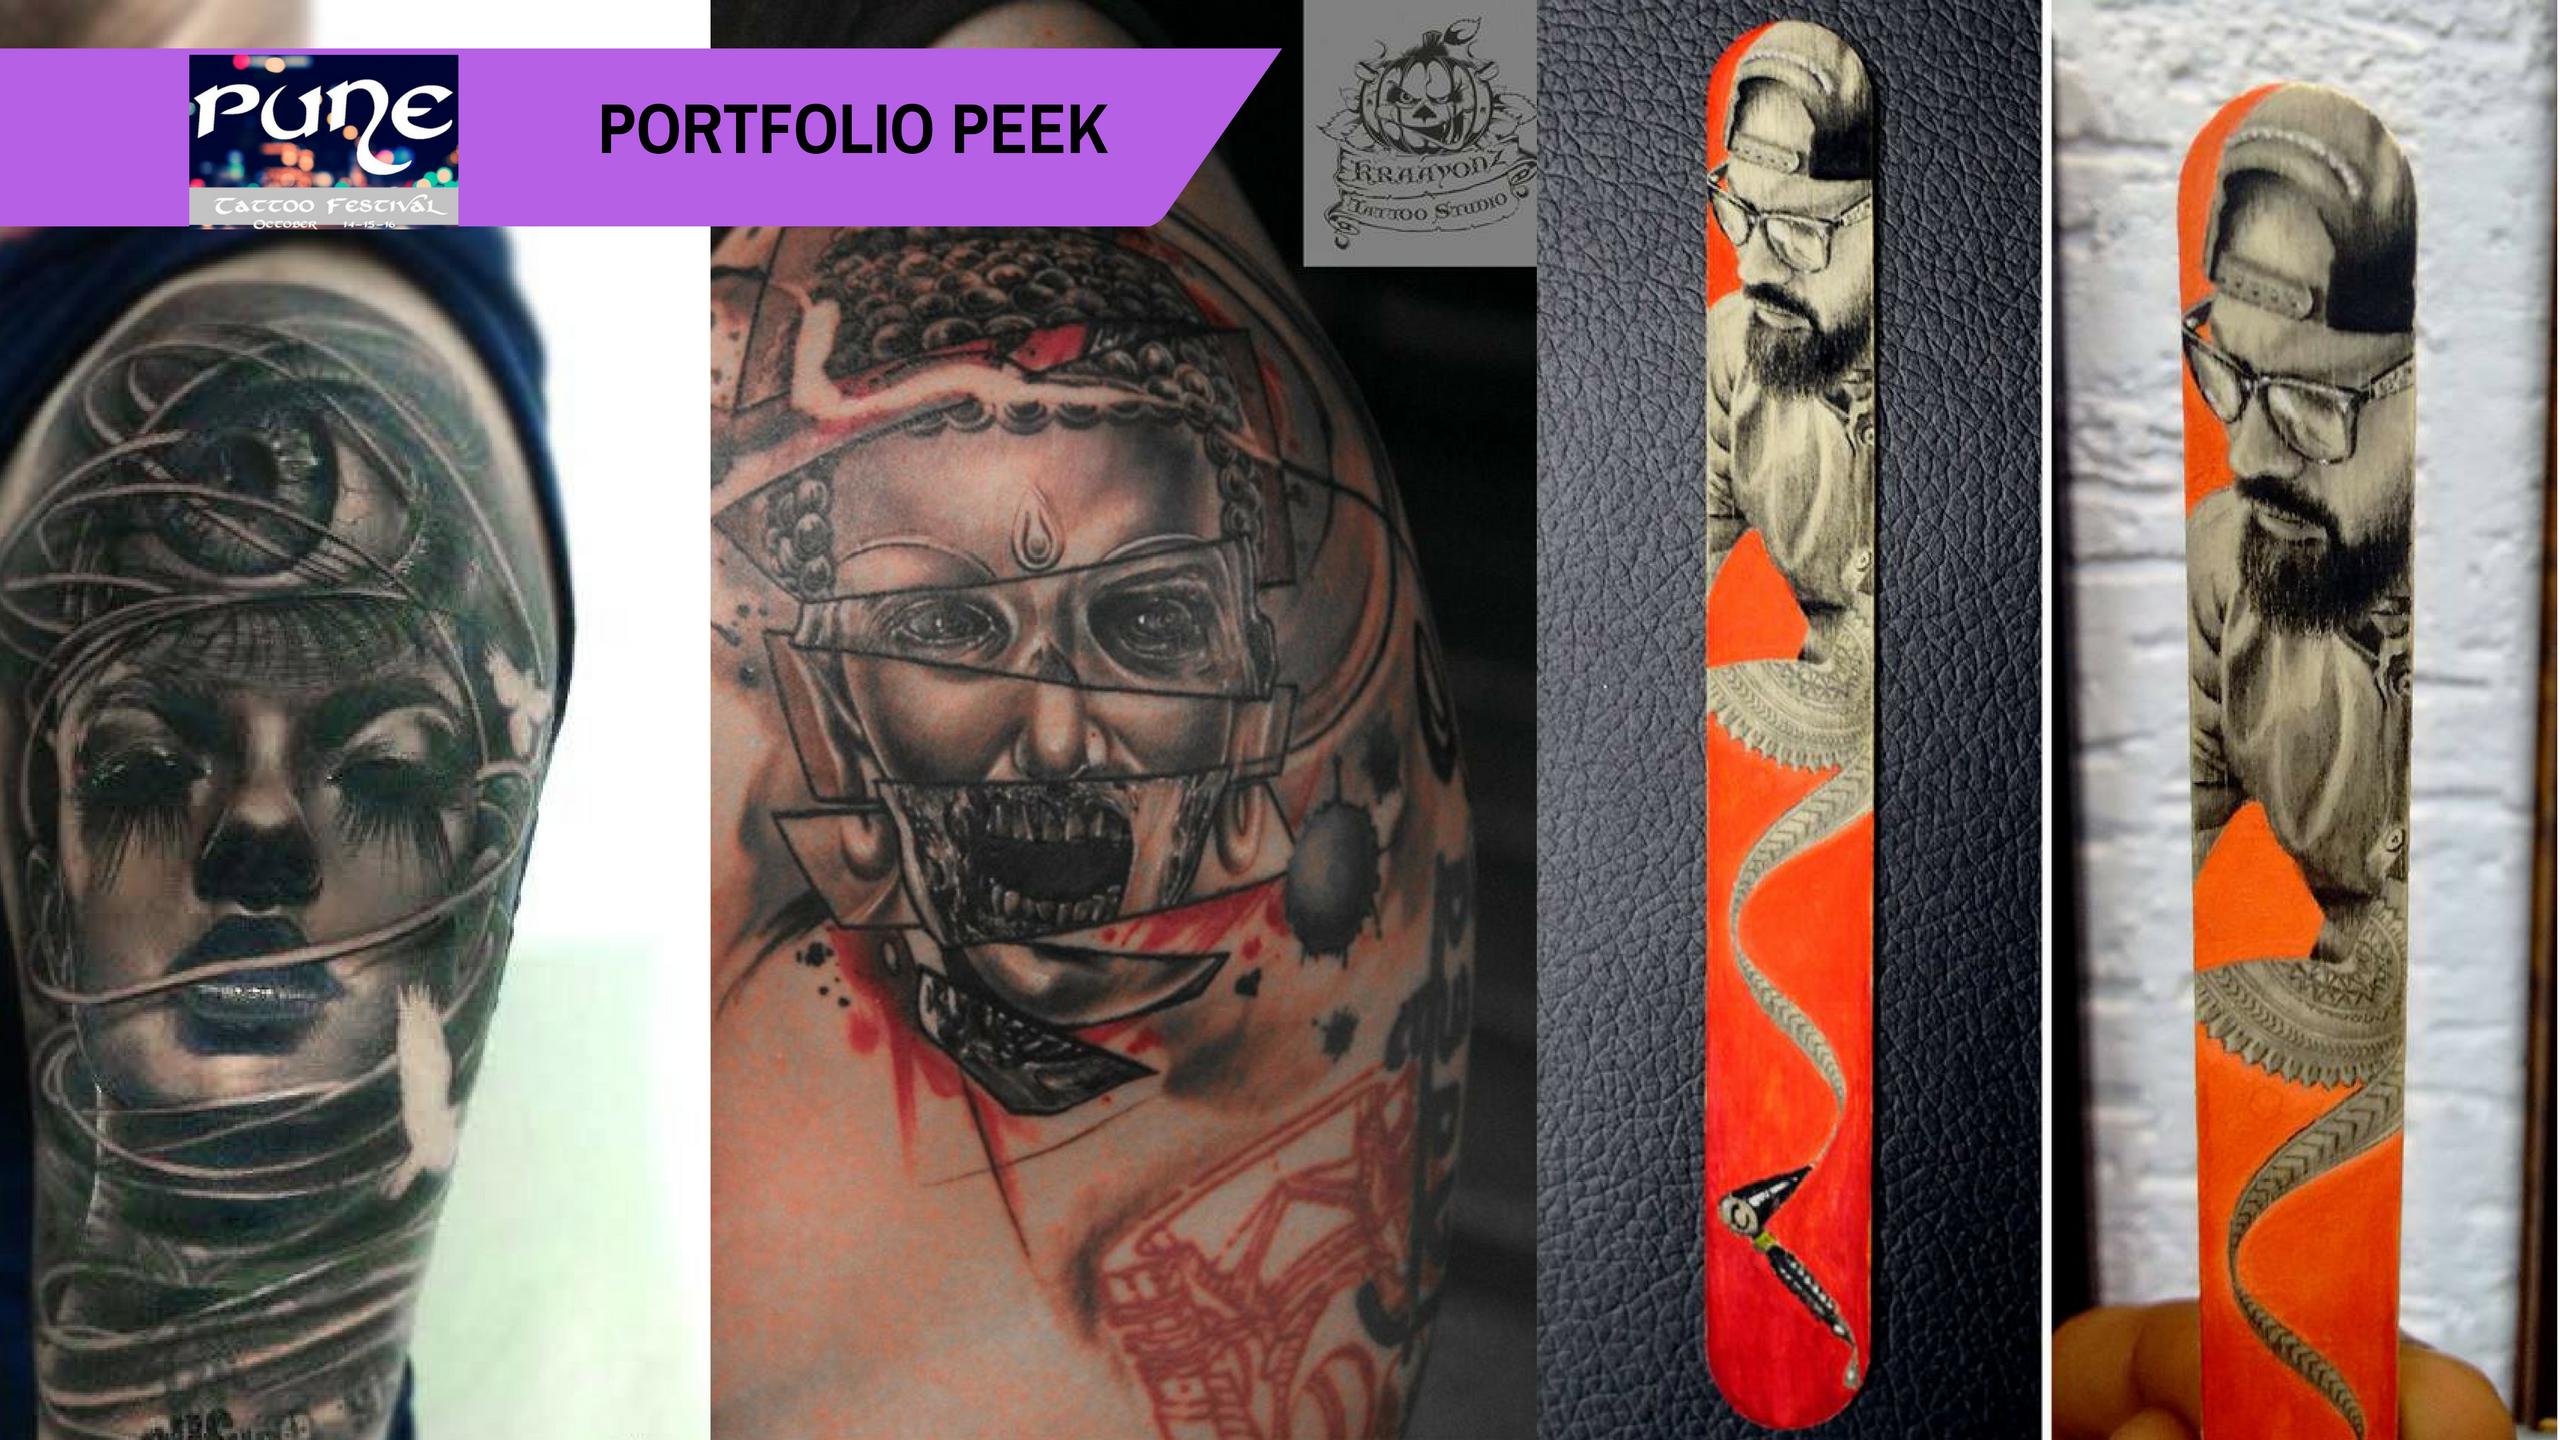 Pune Tattoo Fest Portfolio Peek: Sameer Patange's global vision of Indian tattooing